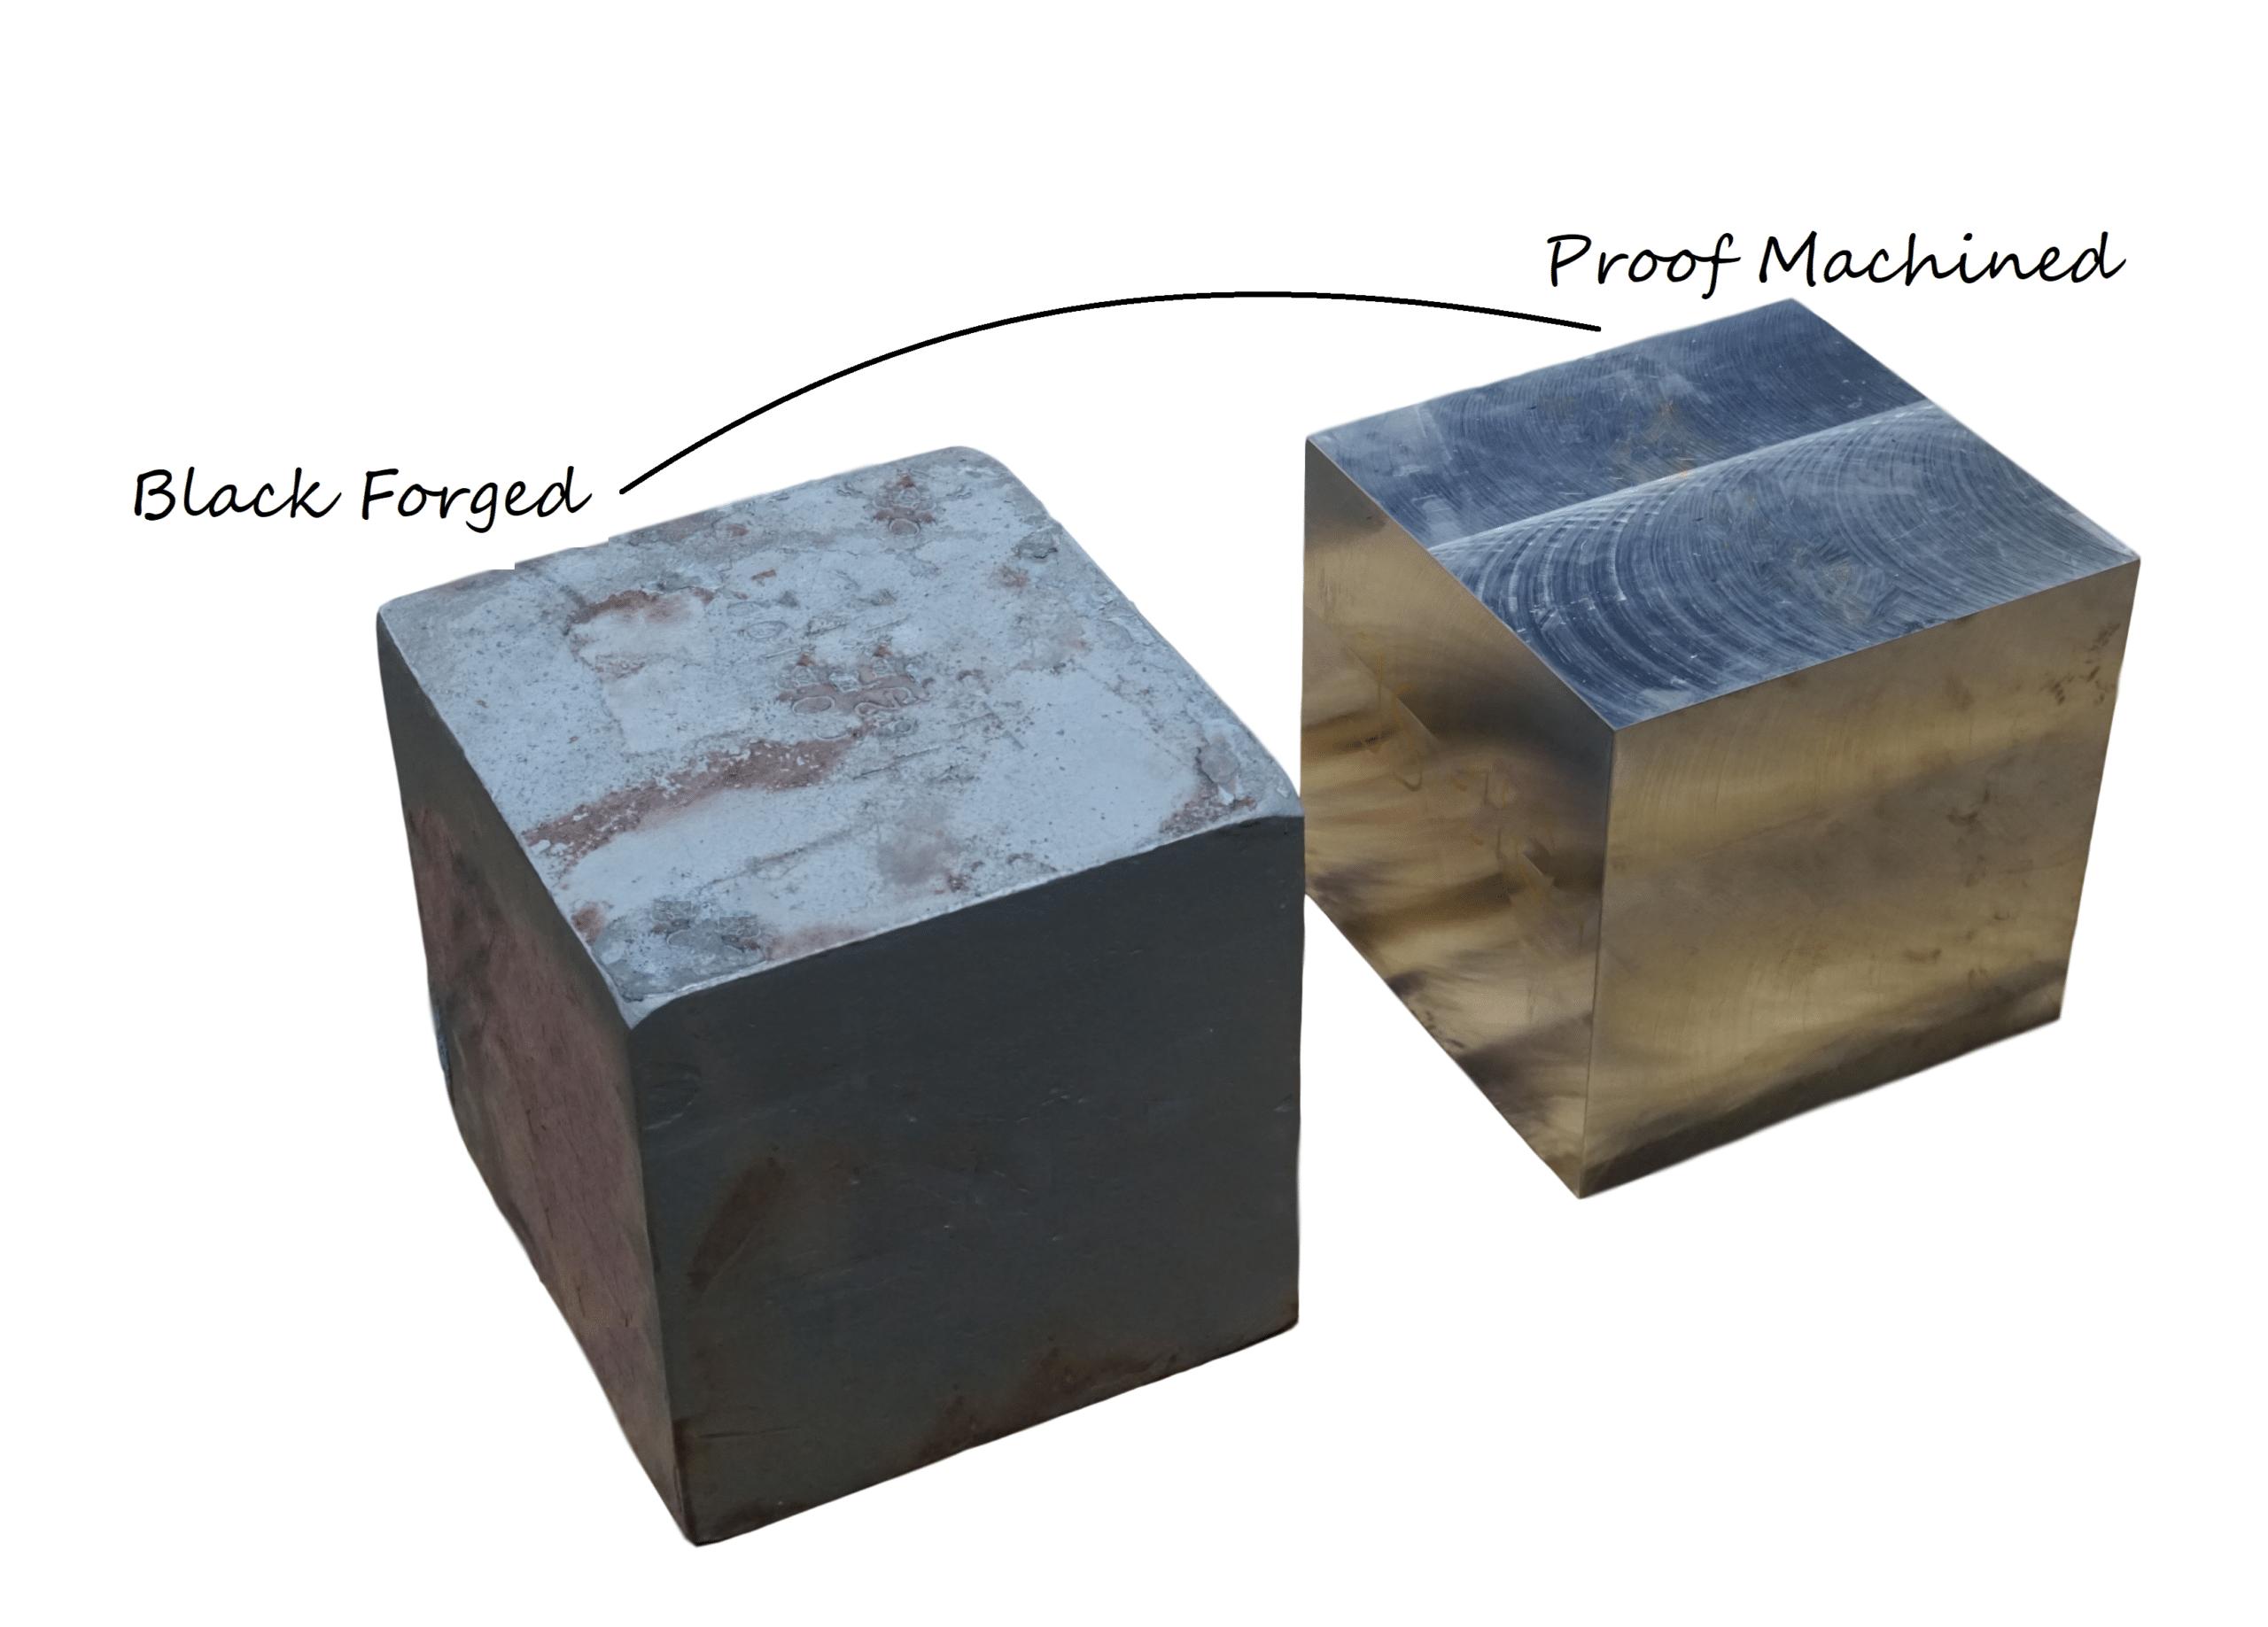 Blocks Black and Proof Machined